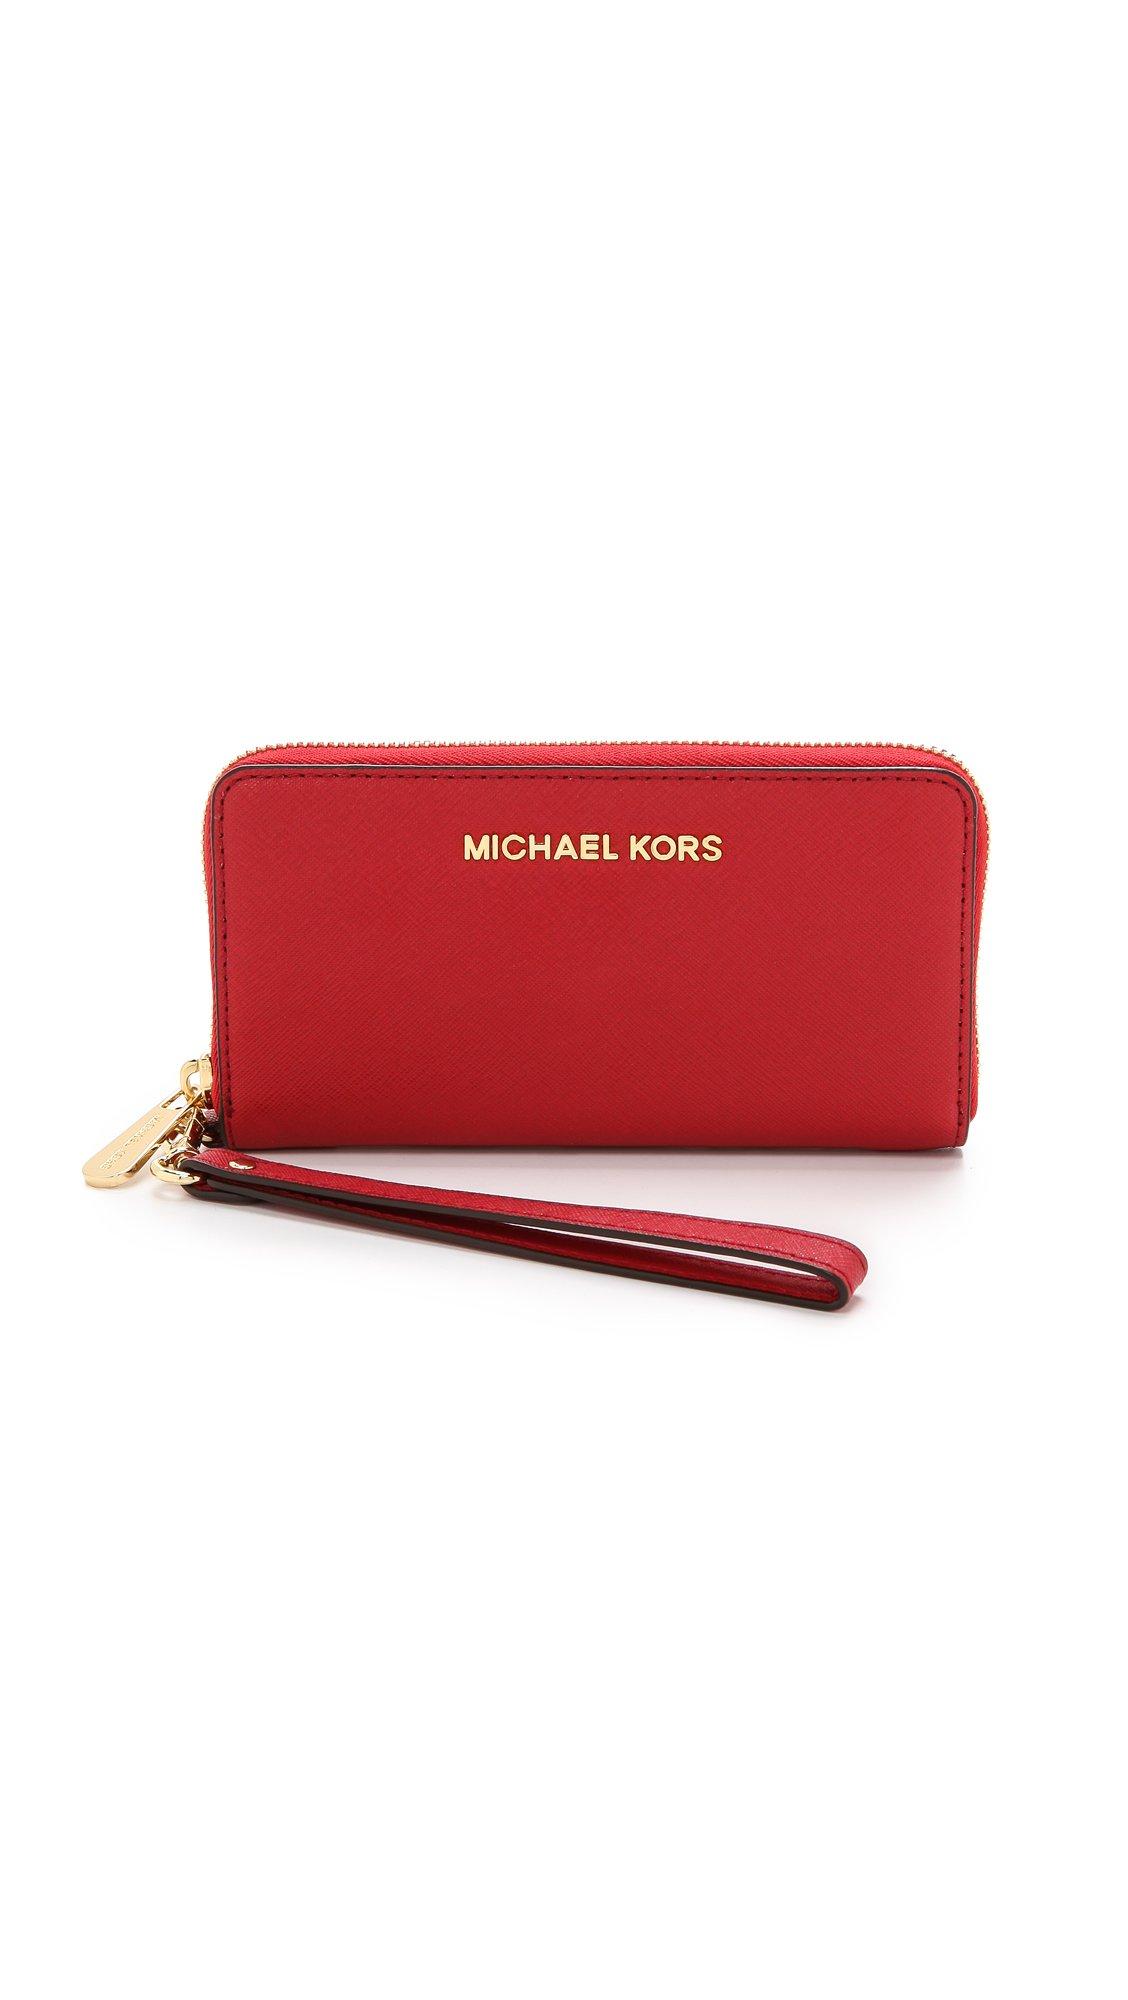 MICHAEL Michael Kors Women's Jet Set Travel Phone Case, Red, One Size by MICHAEL Michael Kors